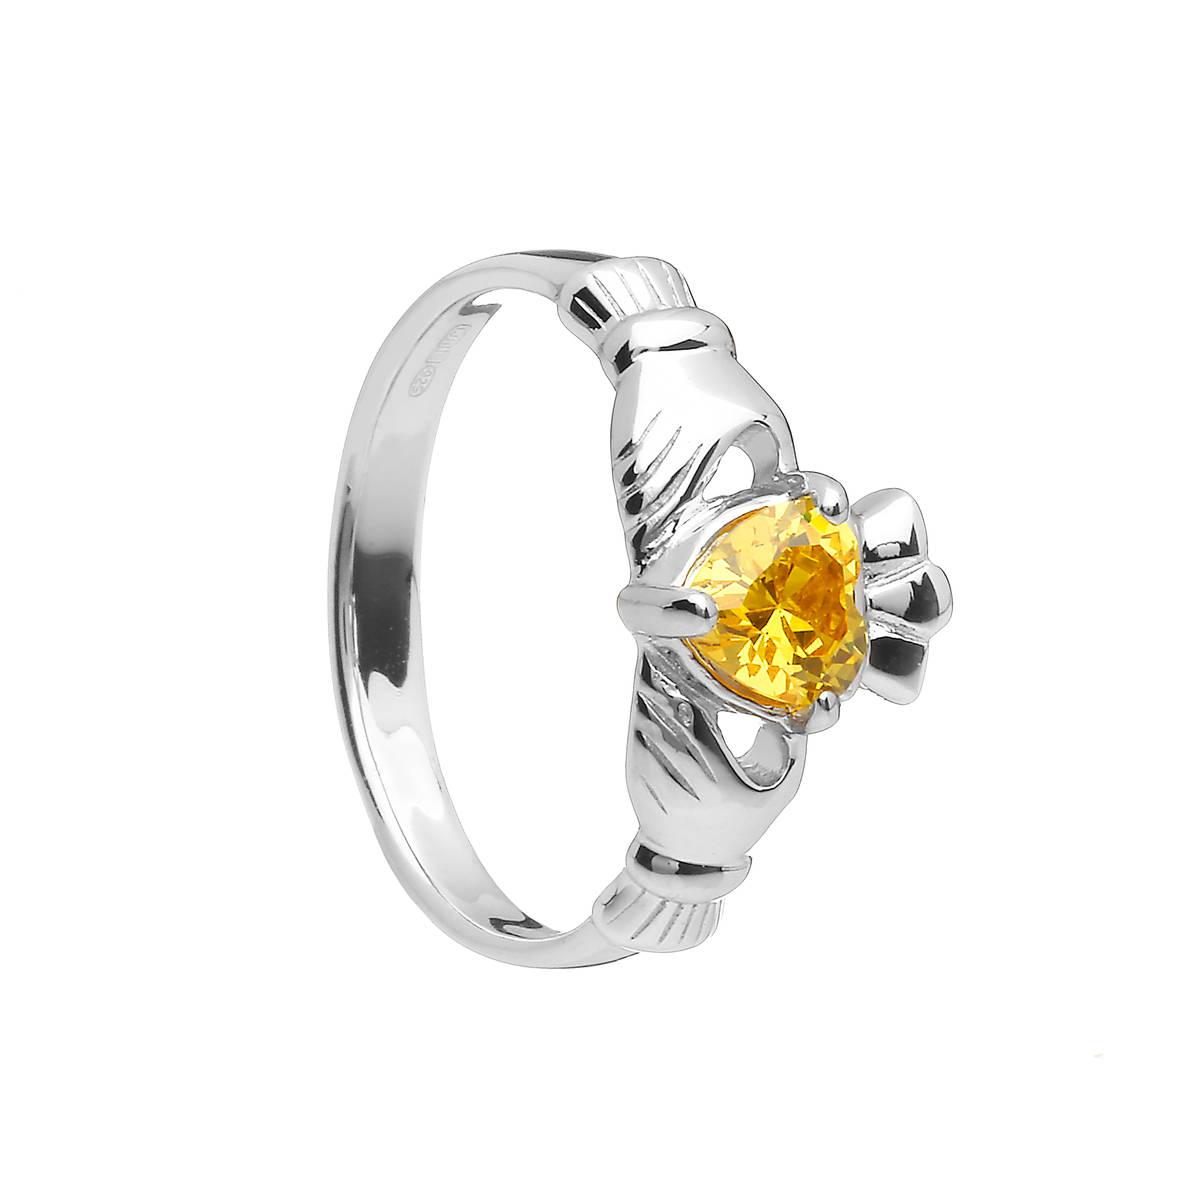 Sterling Silver Classic November Birthstone Claddagh Ring